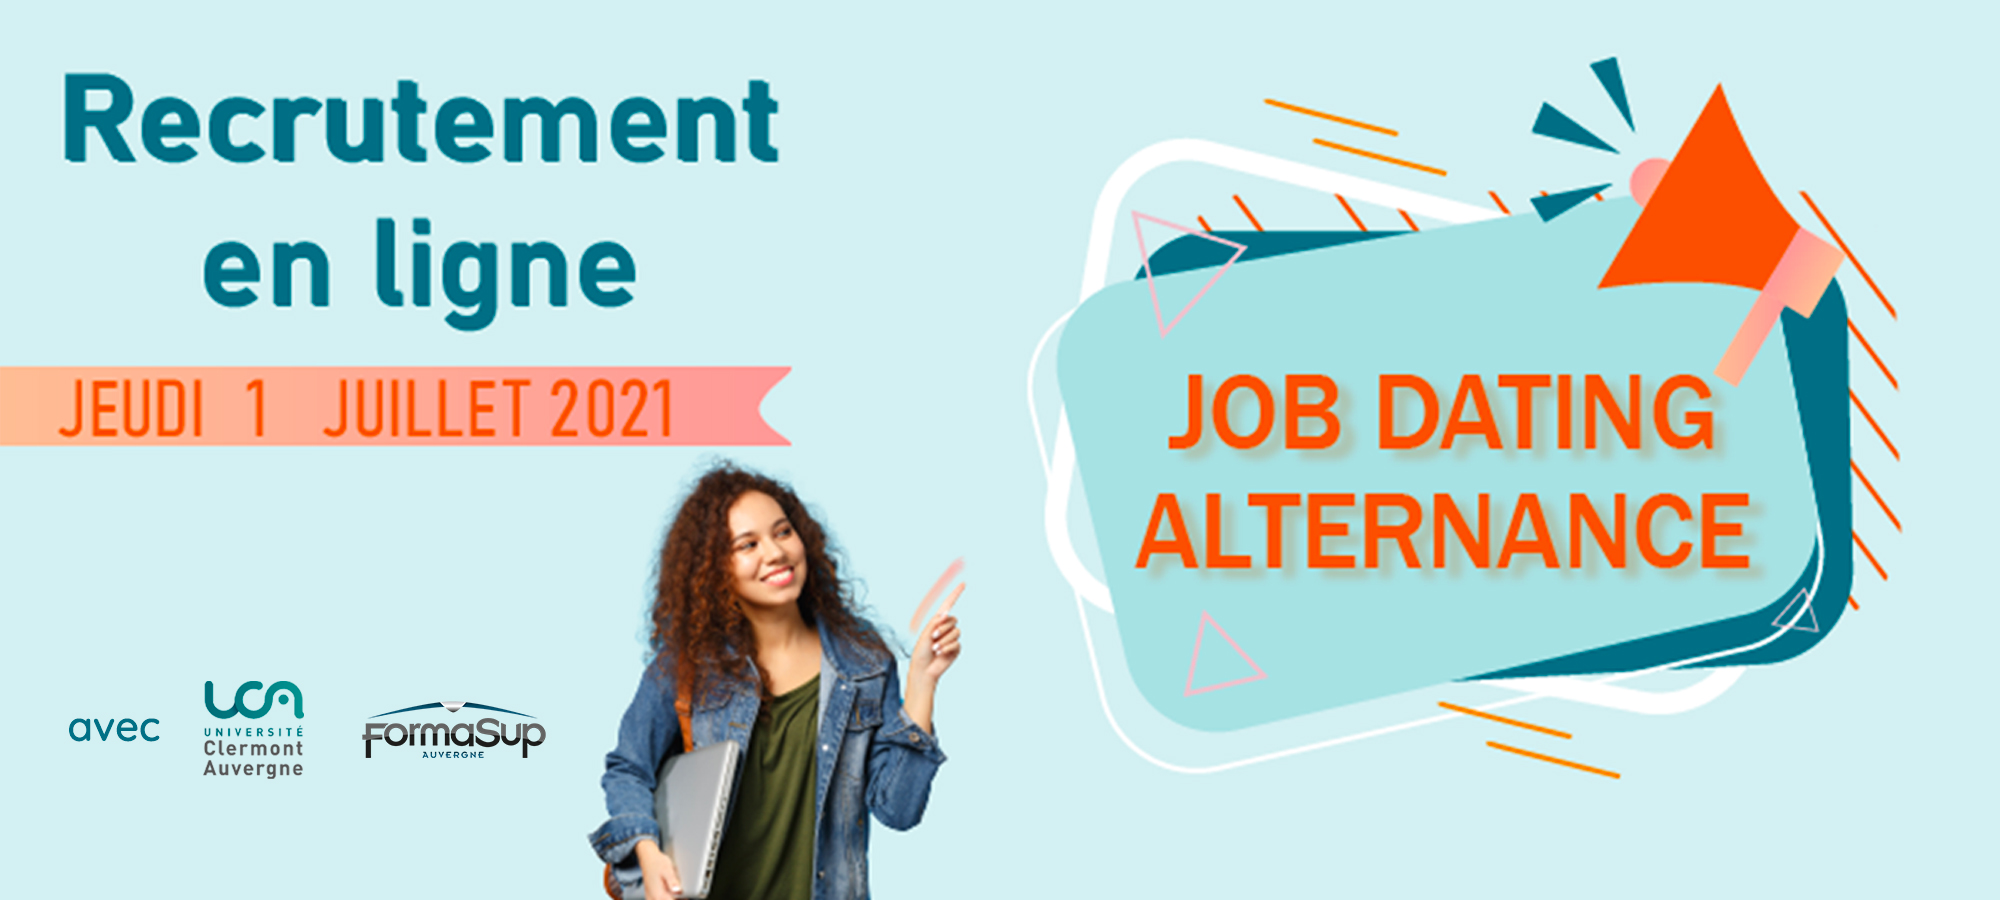 Job Dating Alternance UCA - FormaSup Auvergne